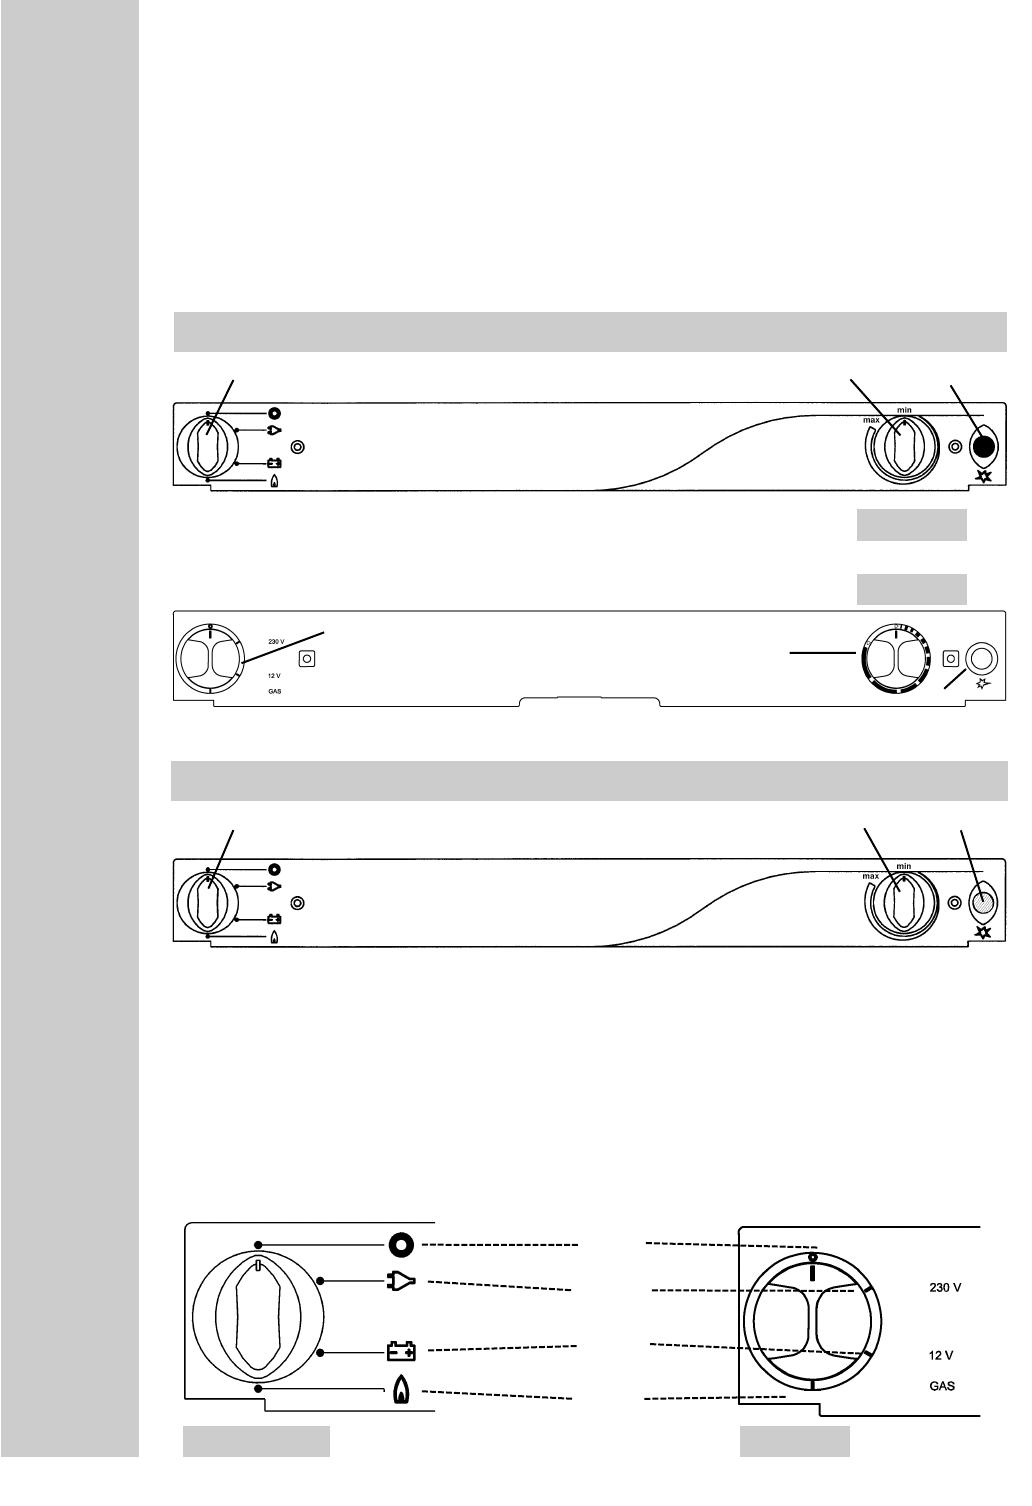 Electrolux Rm 6270 Bedienungsanleitung